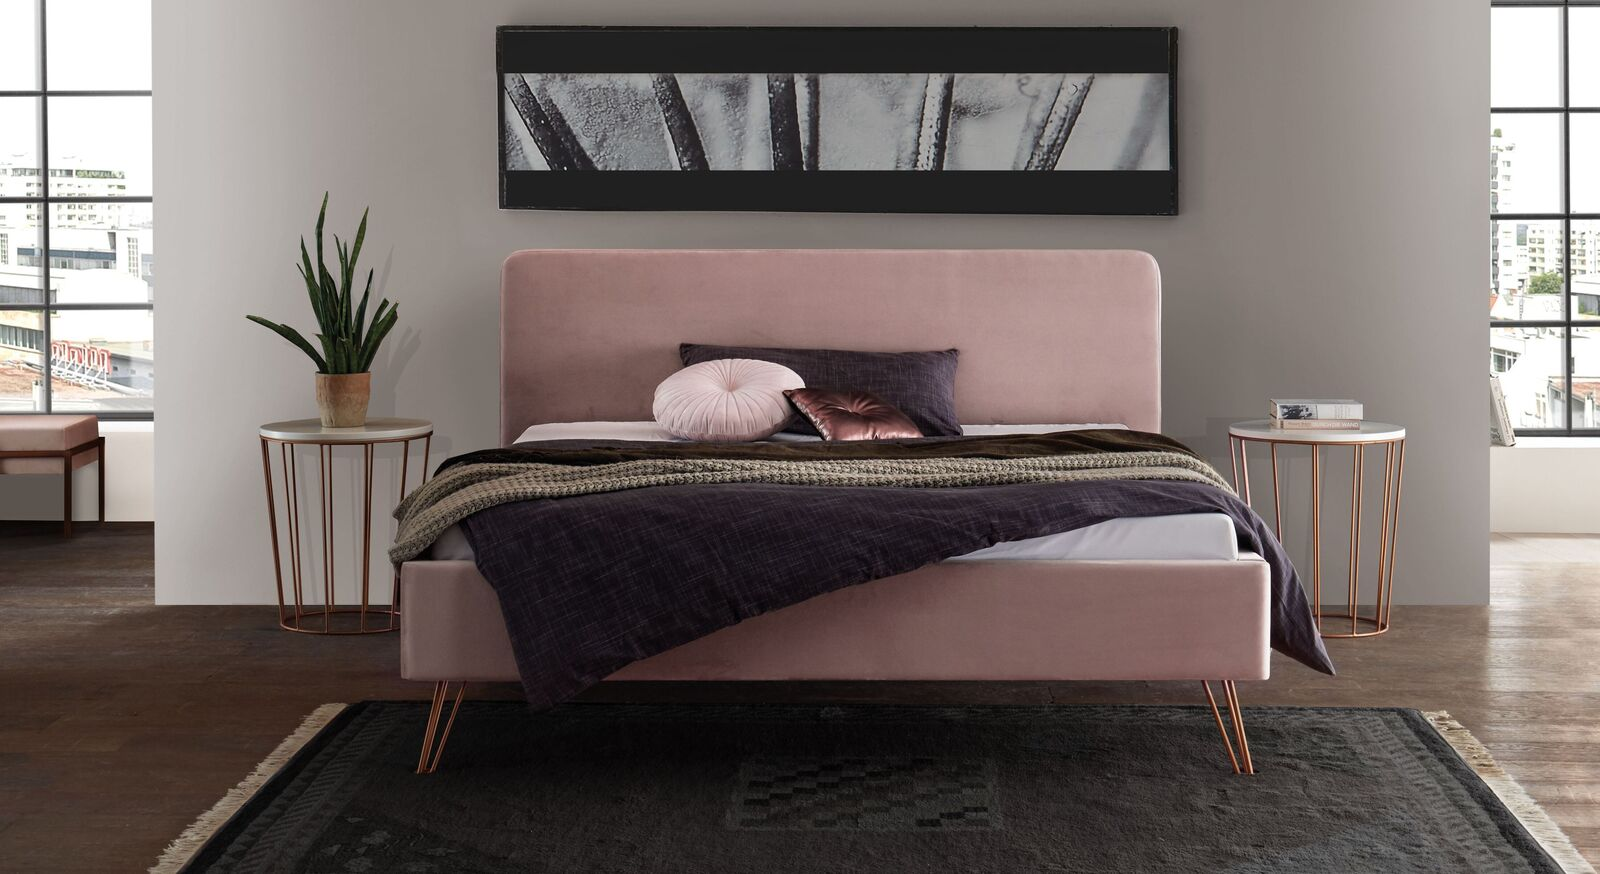 Bett Marfasia aus blushfarbenem Samt